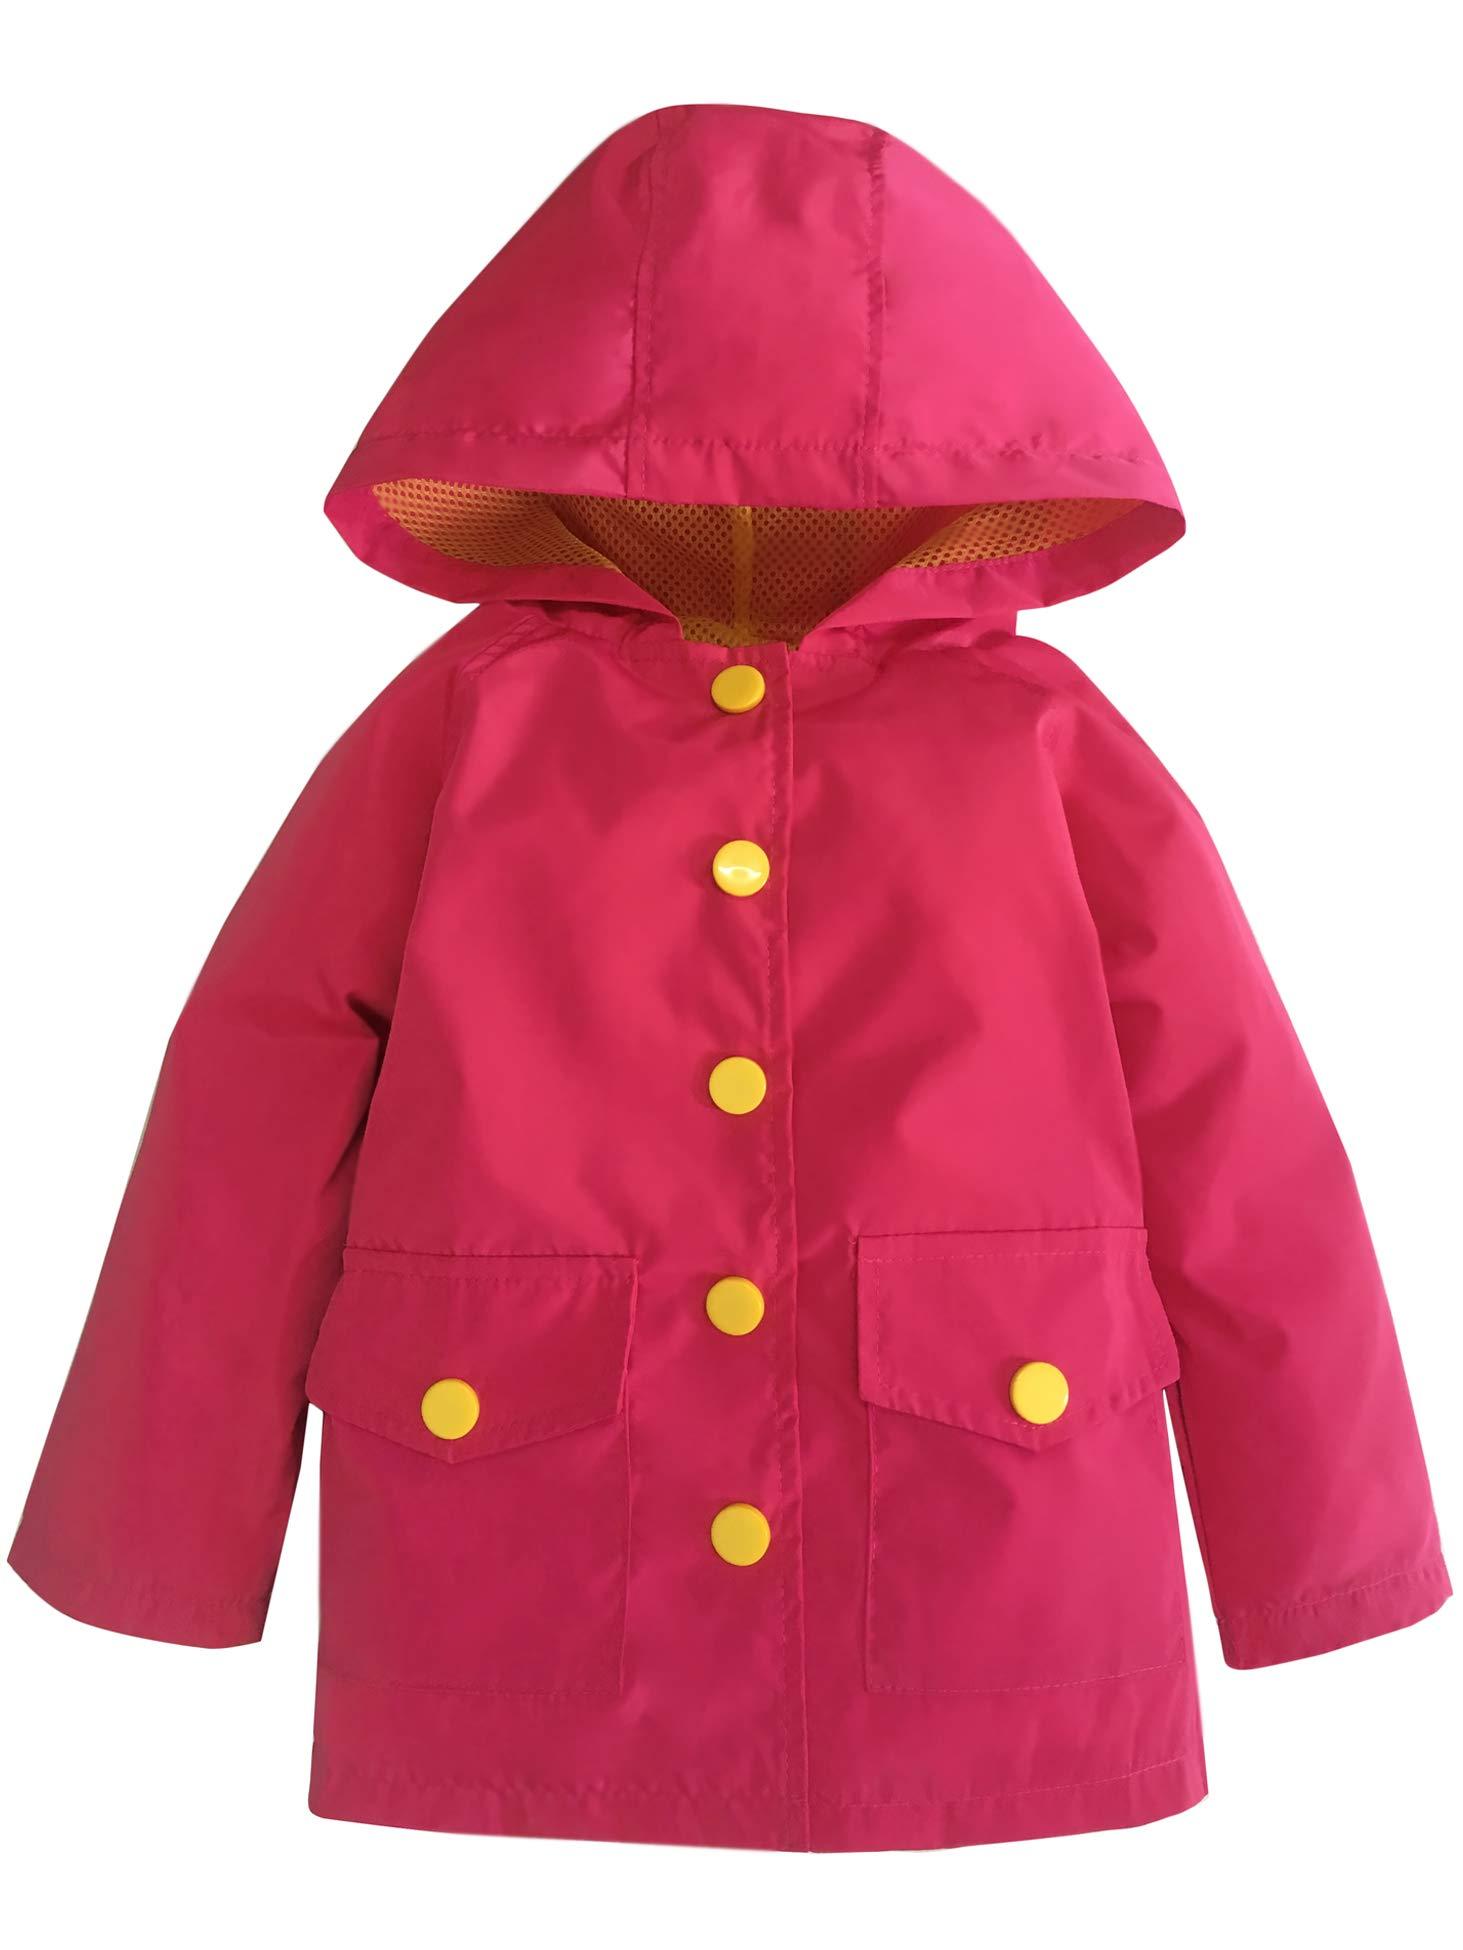 YNIQ Girls Boys Coated Raincoat for Toddler Girls, Hot Pink, 3T